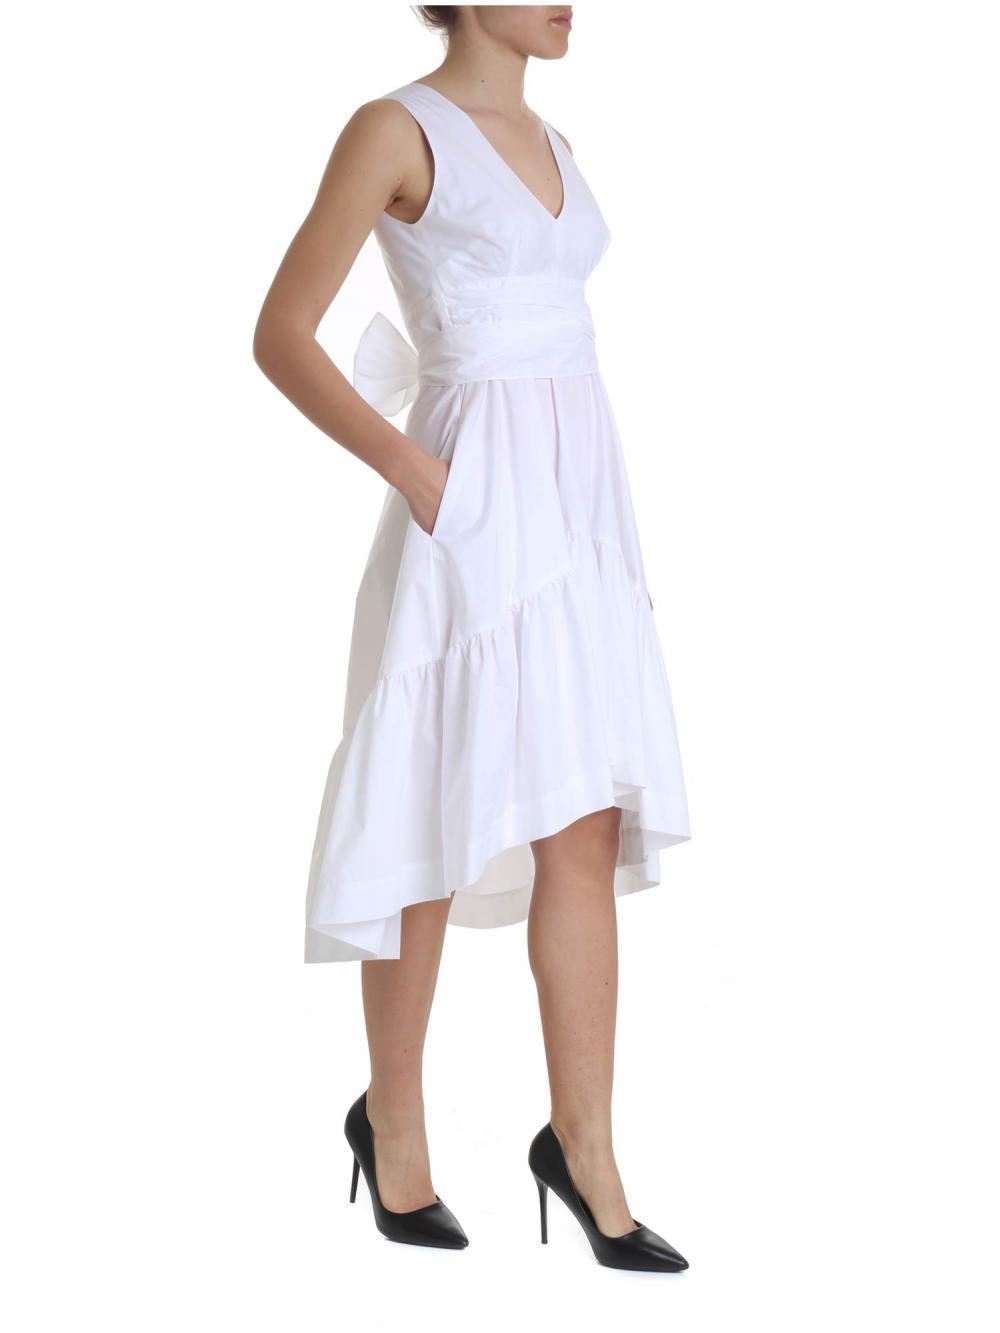 dress-p-a-r-o-s-h-cod-d722433